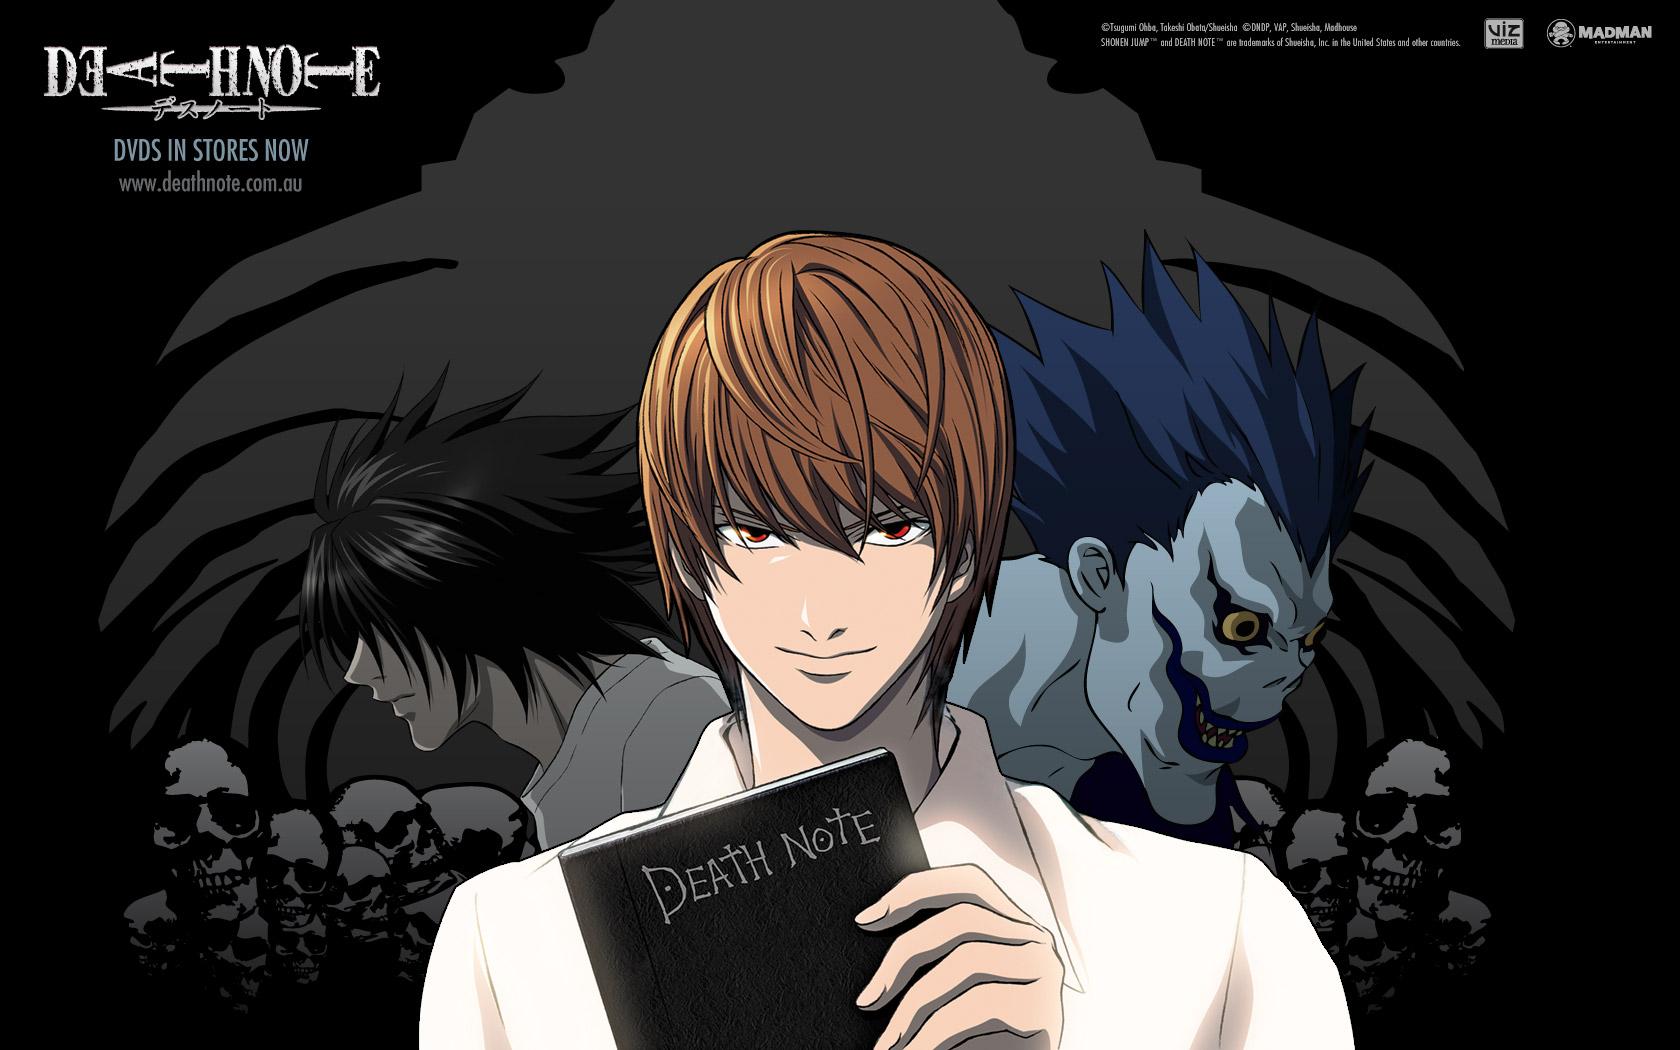 Death Note Backgrounds, Compatible - PC, Mobile, Gadgets  1680x1050 px